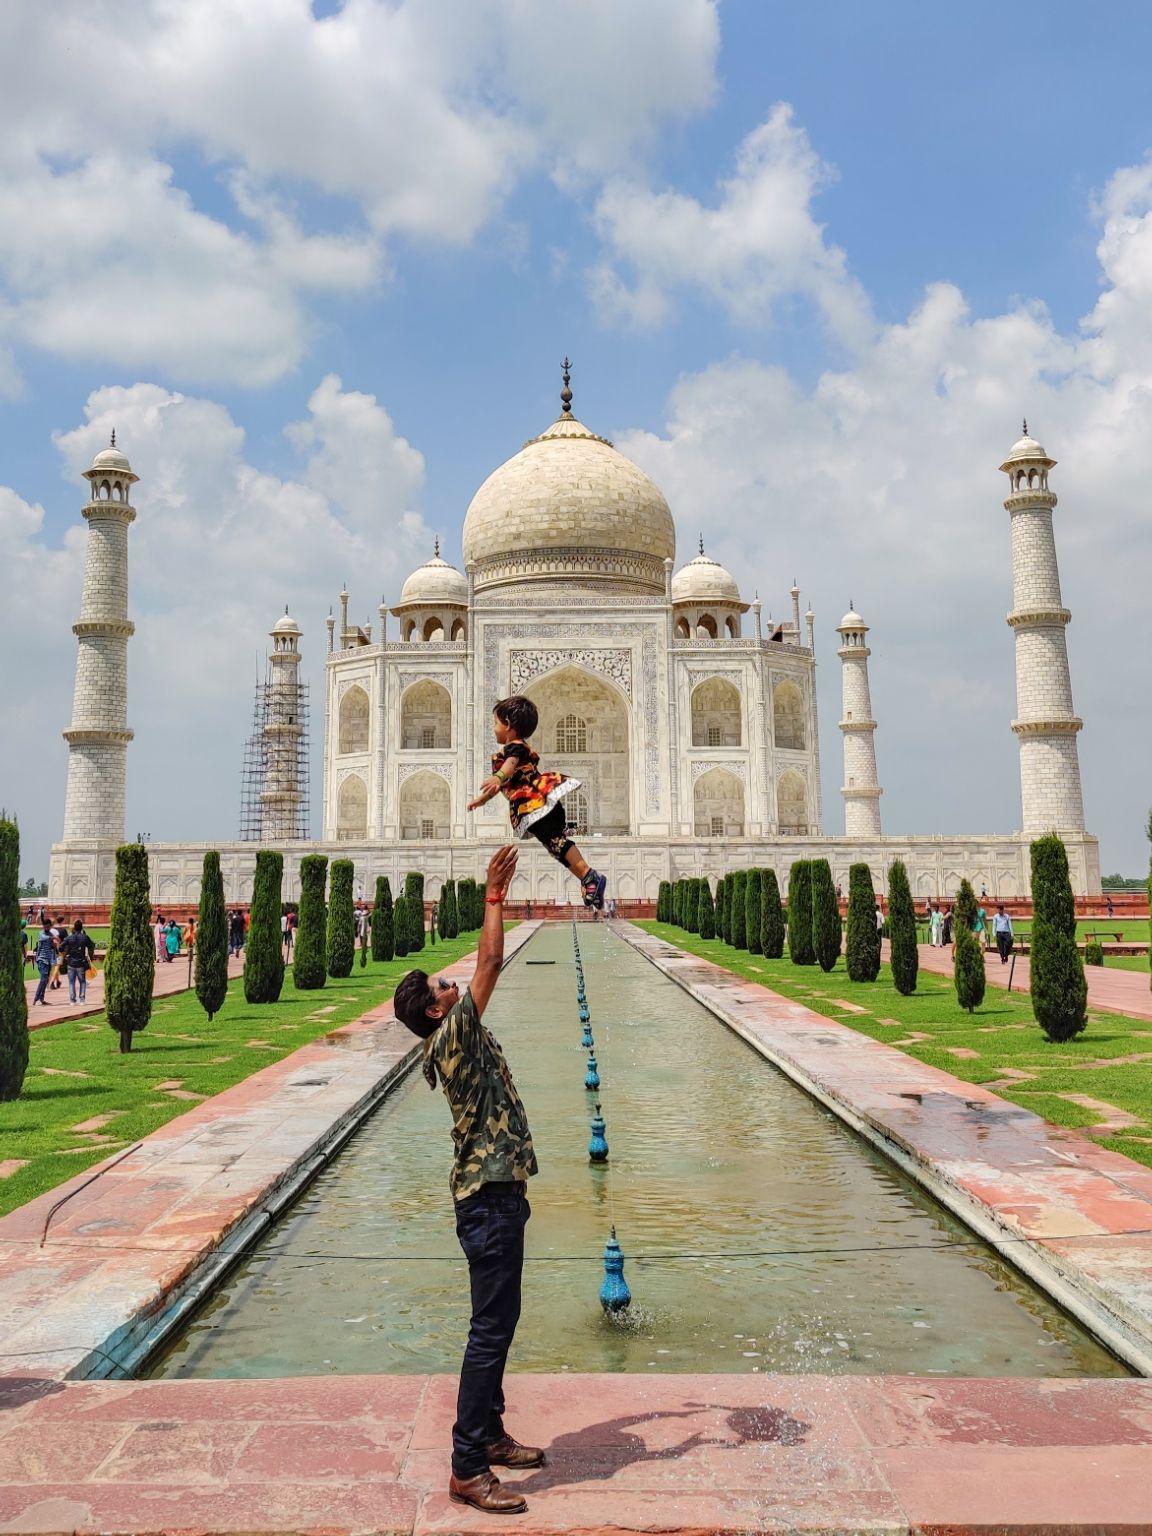 Photo of Taj Mahal By Nitish Desai